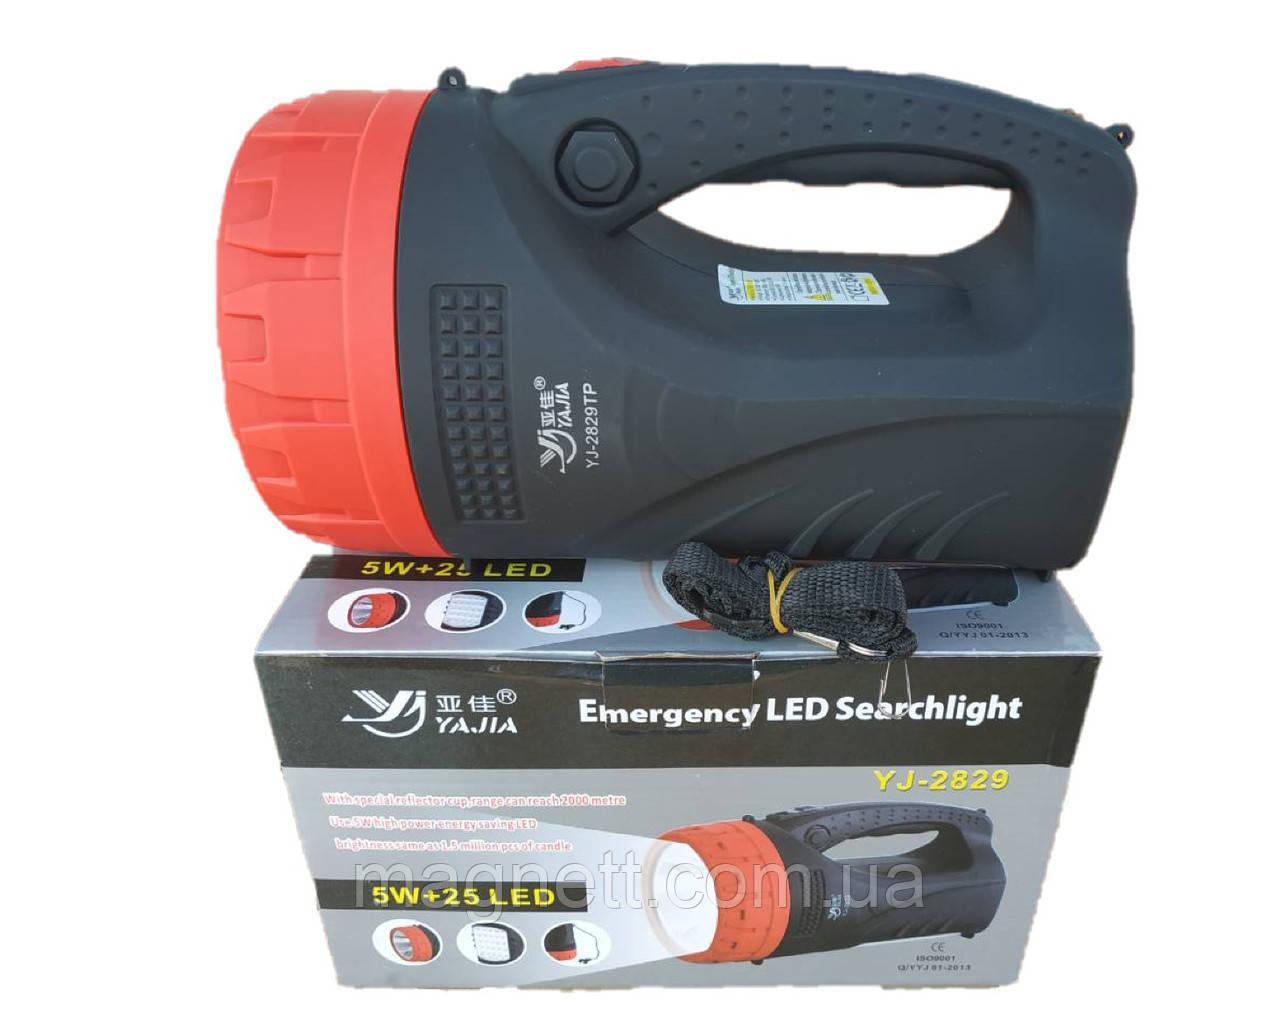 Аккумуляторный фонарь прожектор Yajia YJ-2829